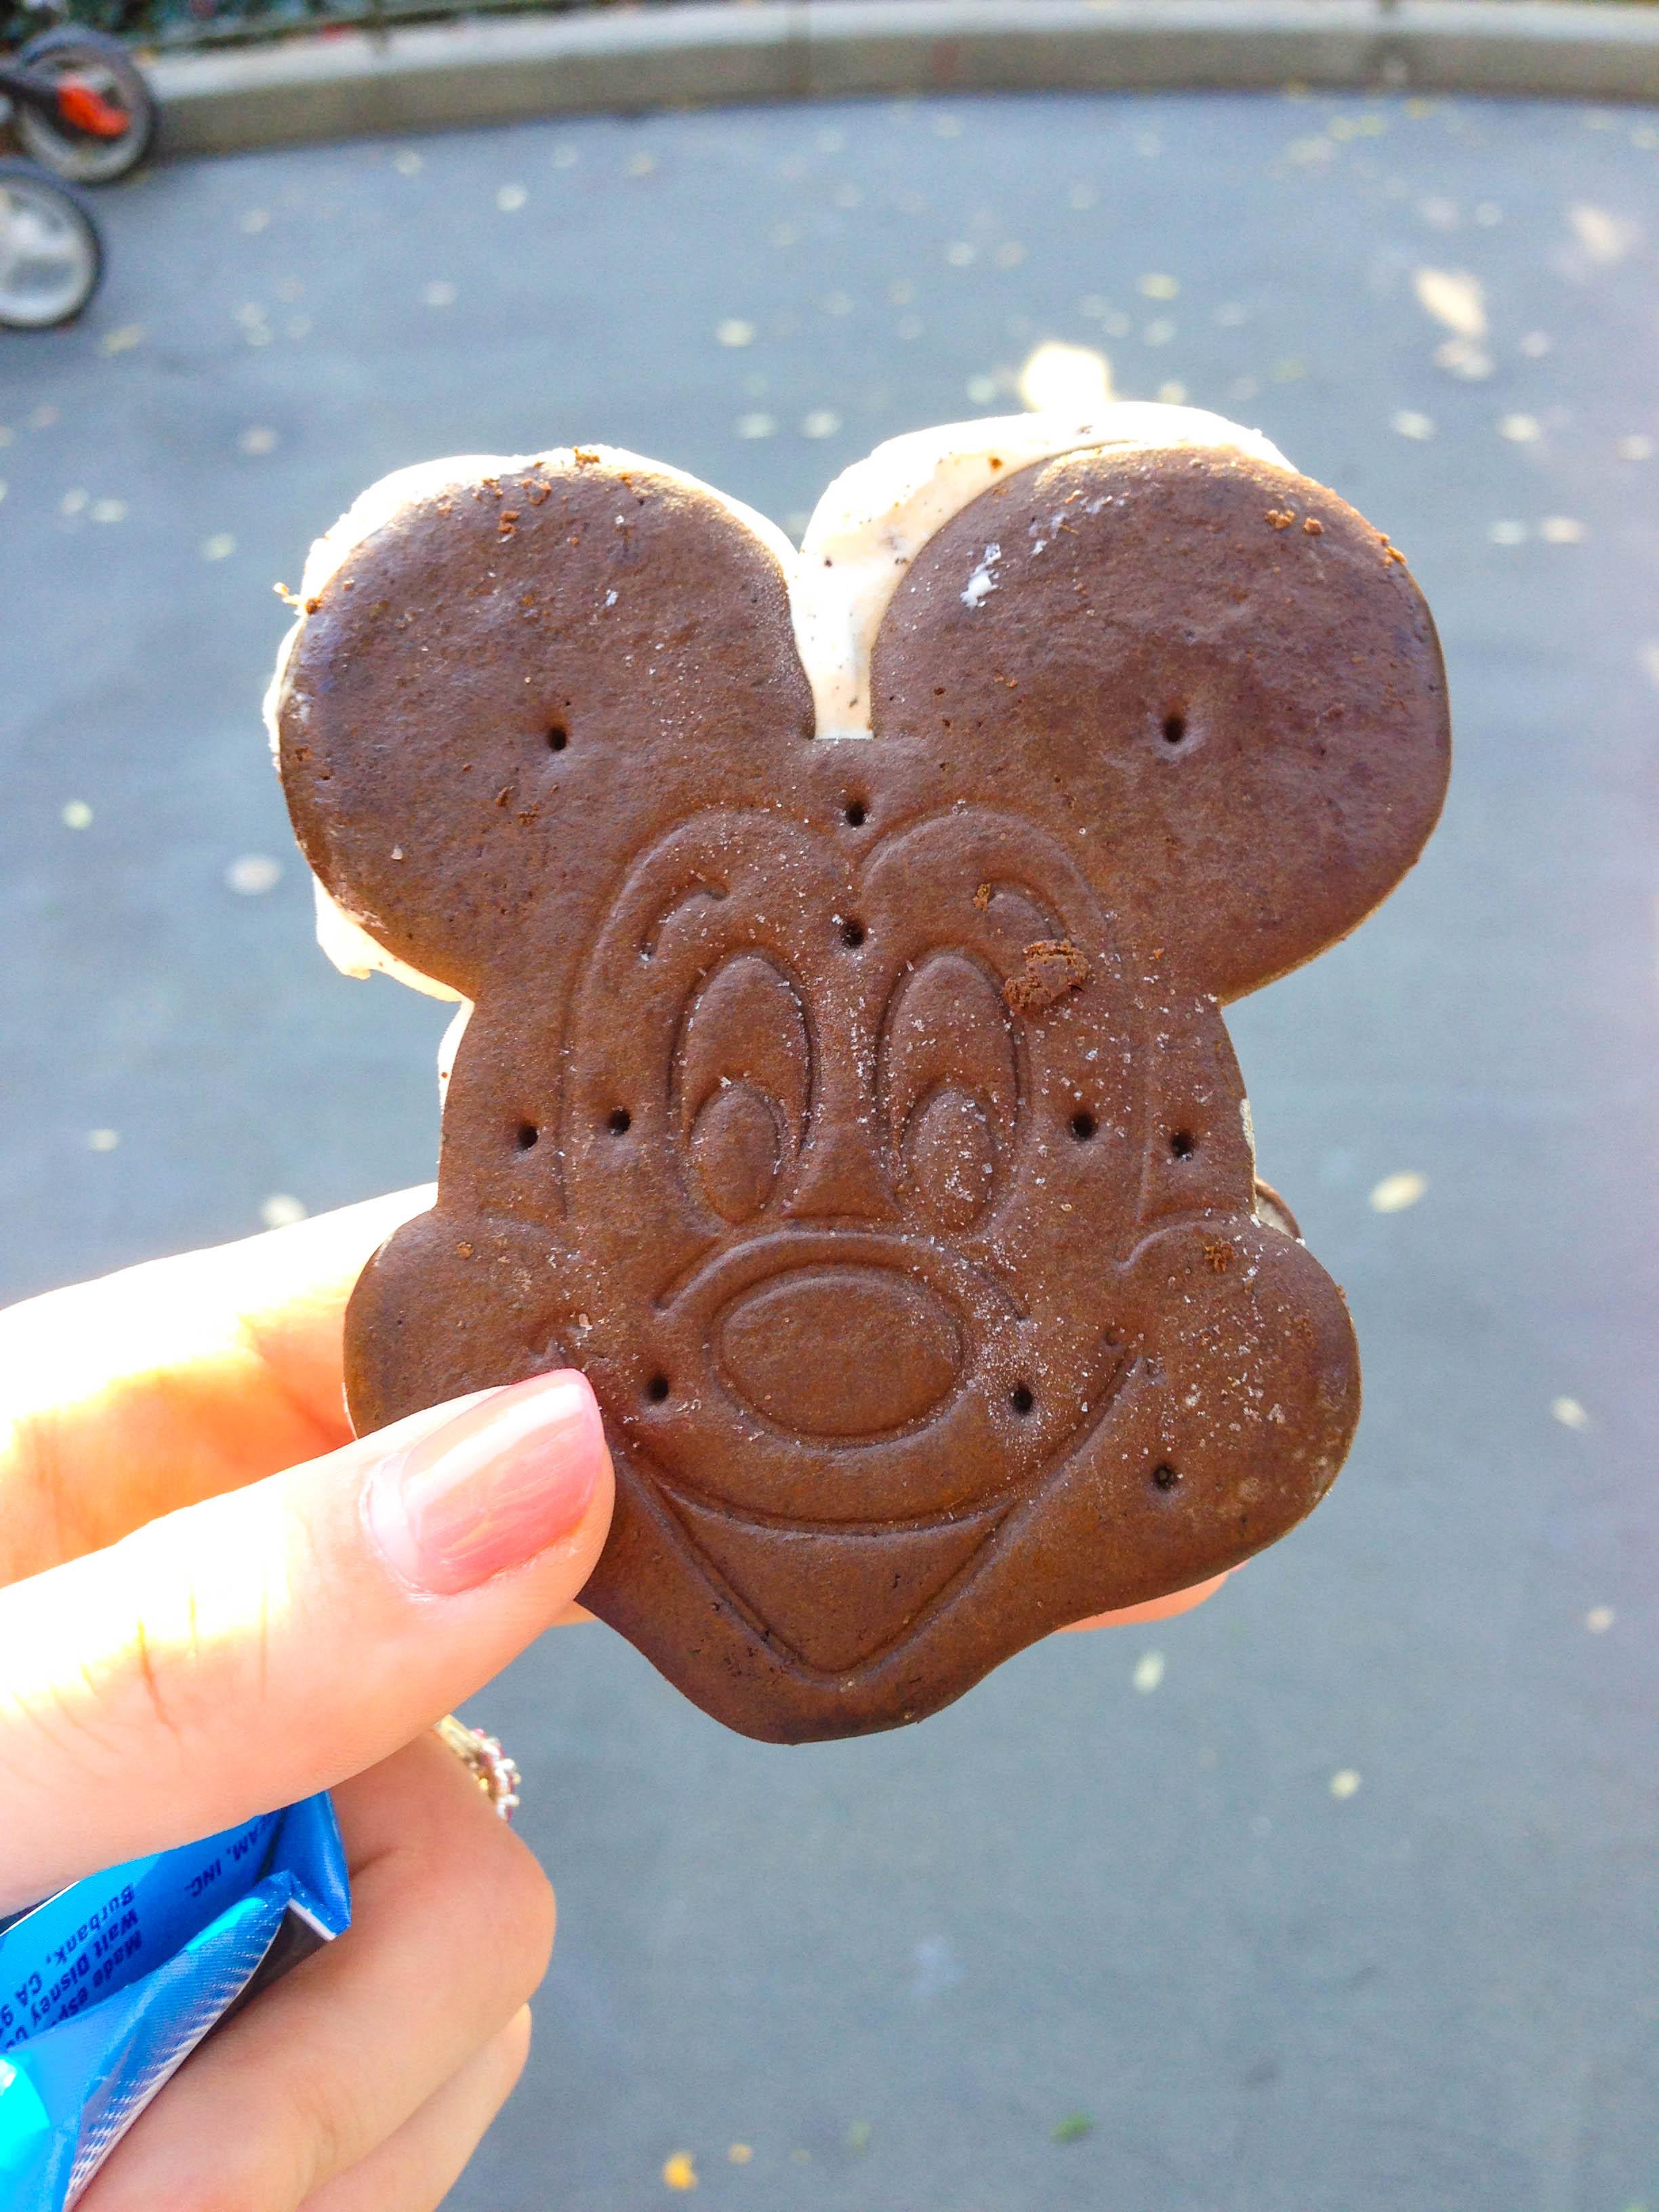 Mickey Ice Cream Sandwich Disneyland